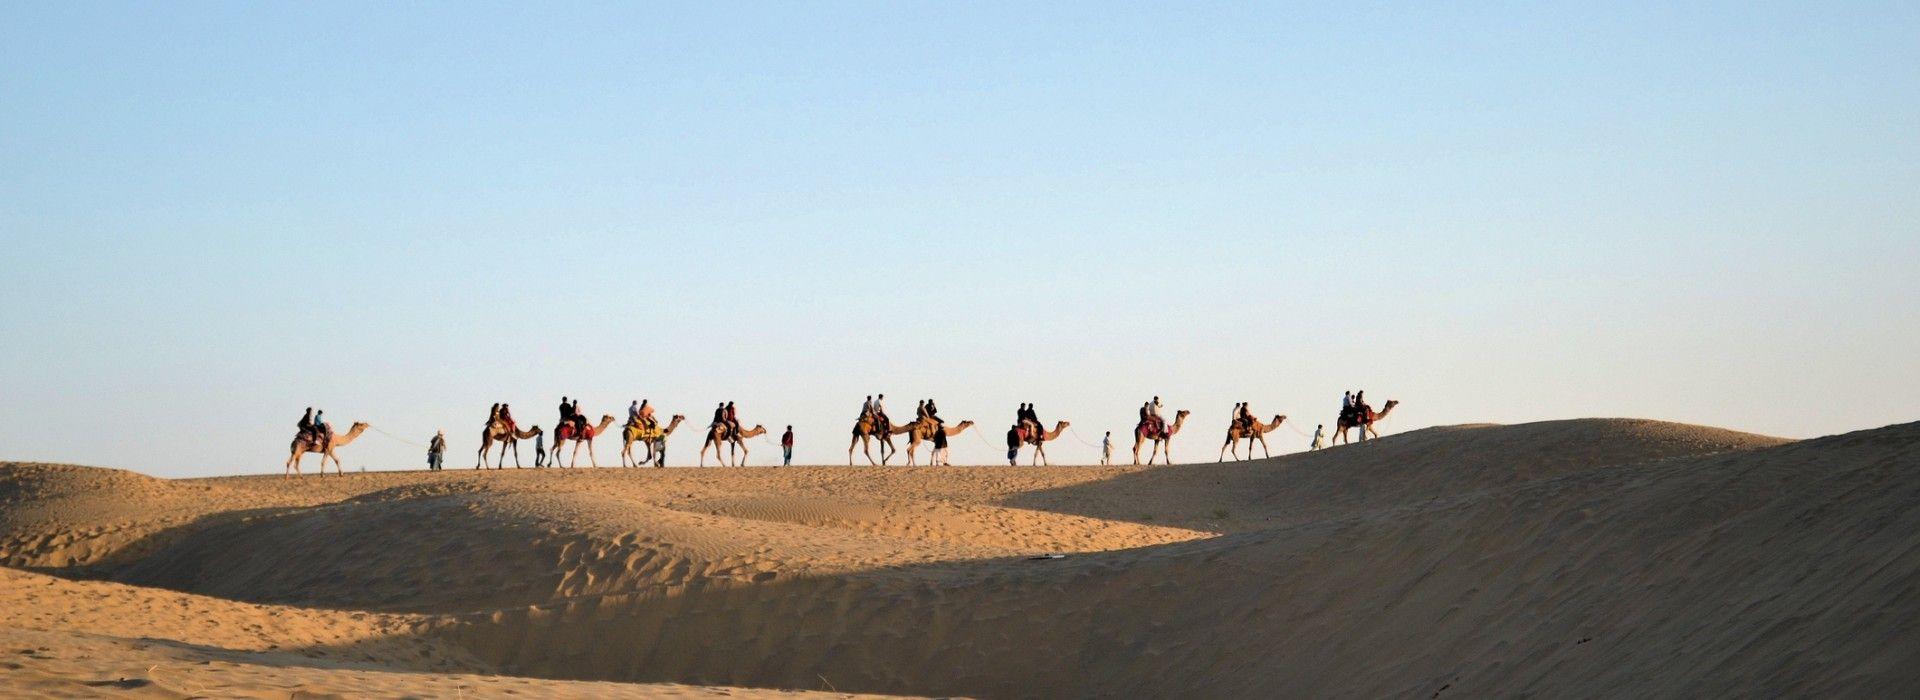 Cultural, religious and historic sites Tours in Khartoum